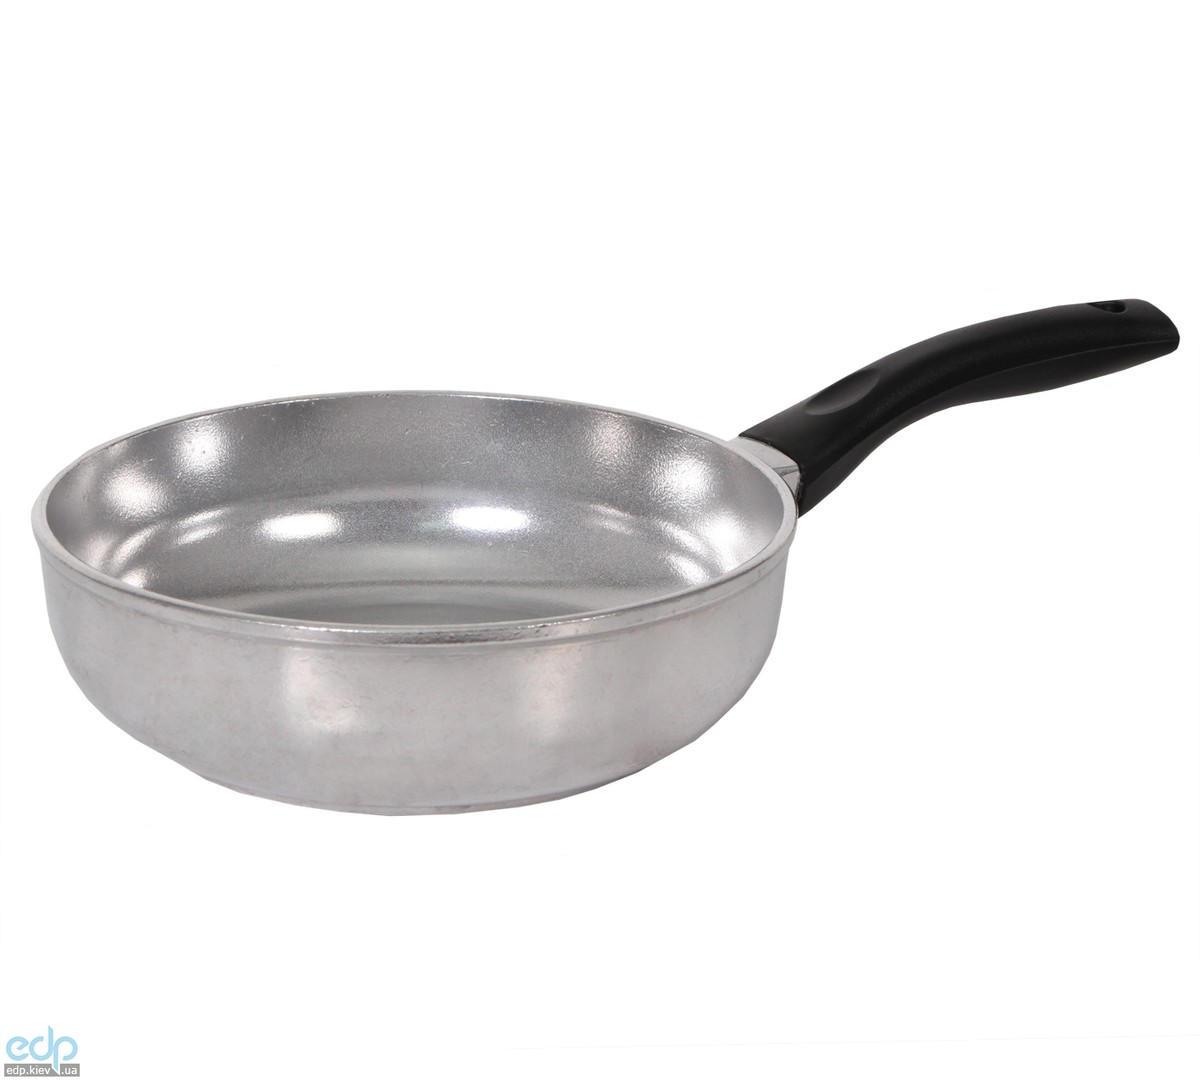 Биол - Сковородка Линия Блеск без крышки диаметр 22 см (2209Б)